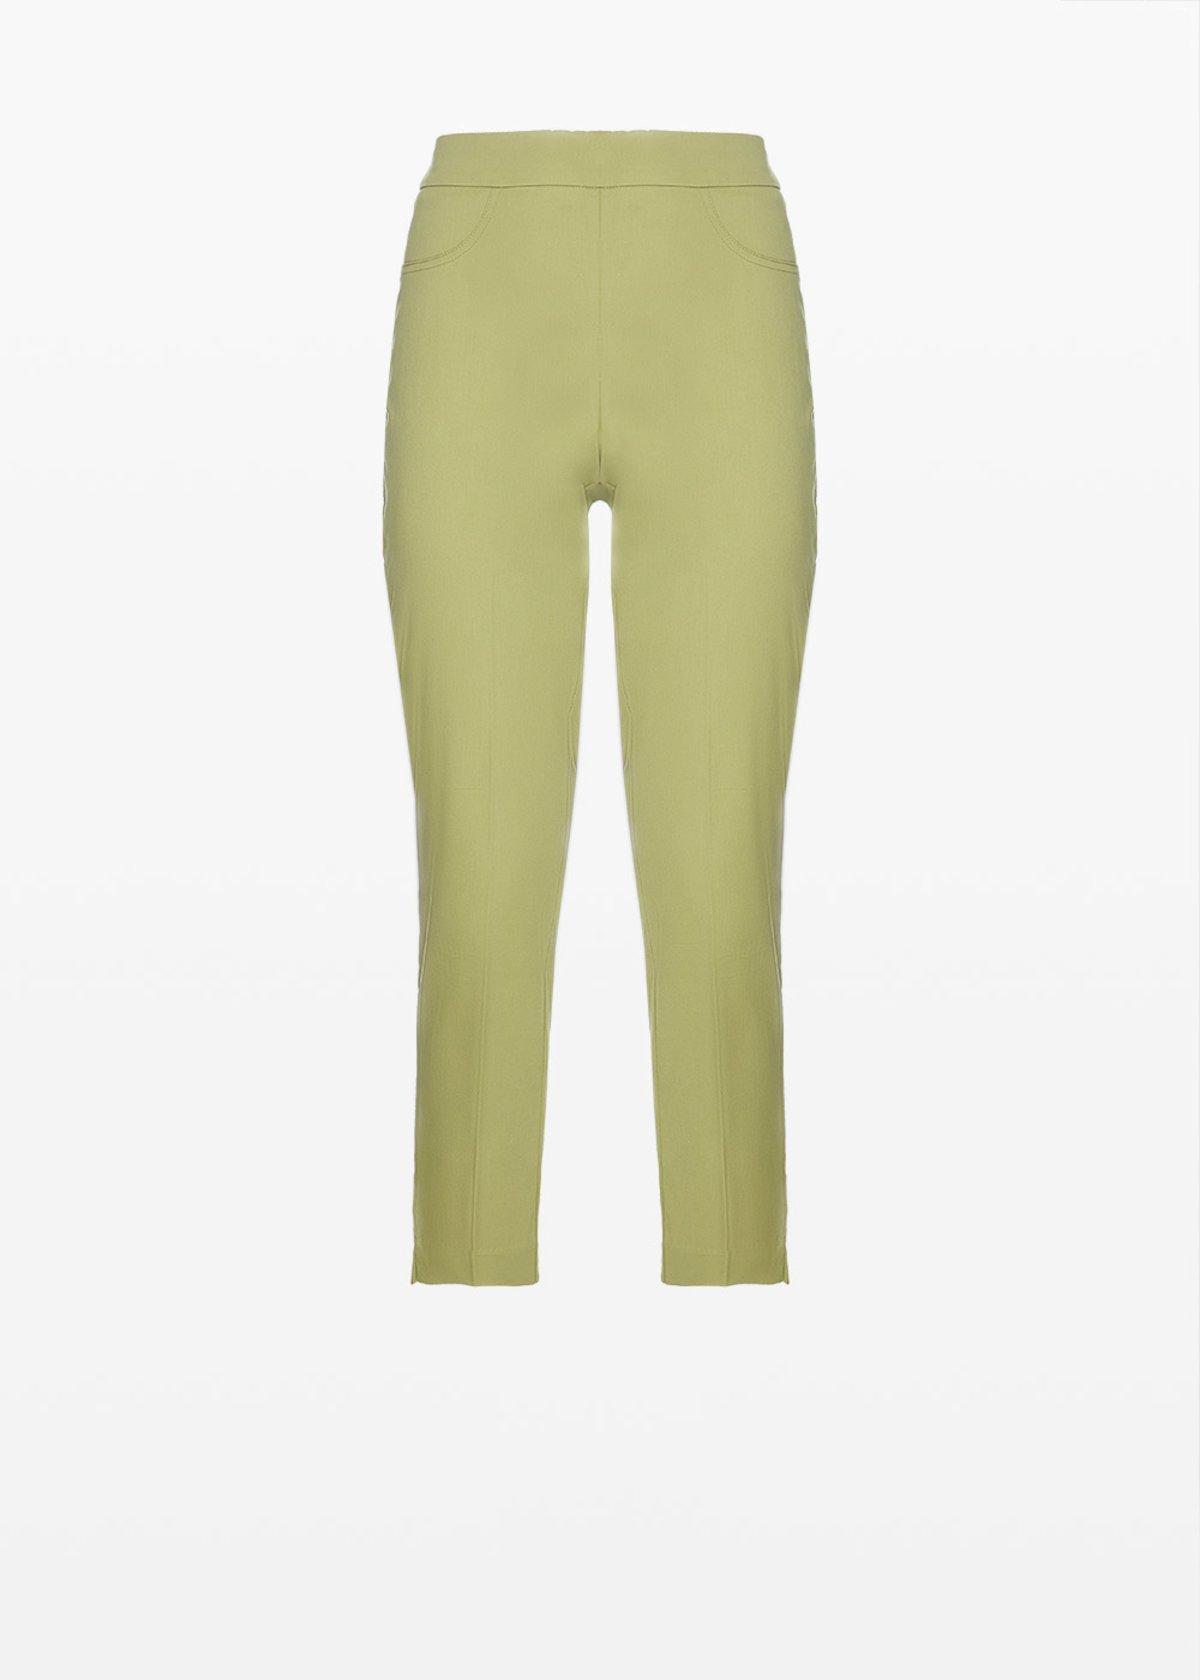 Capri Pants 'Piero6' Scarlett design in cotton sateen - Alga - Woman